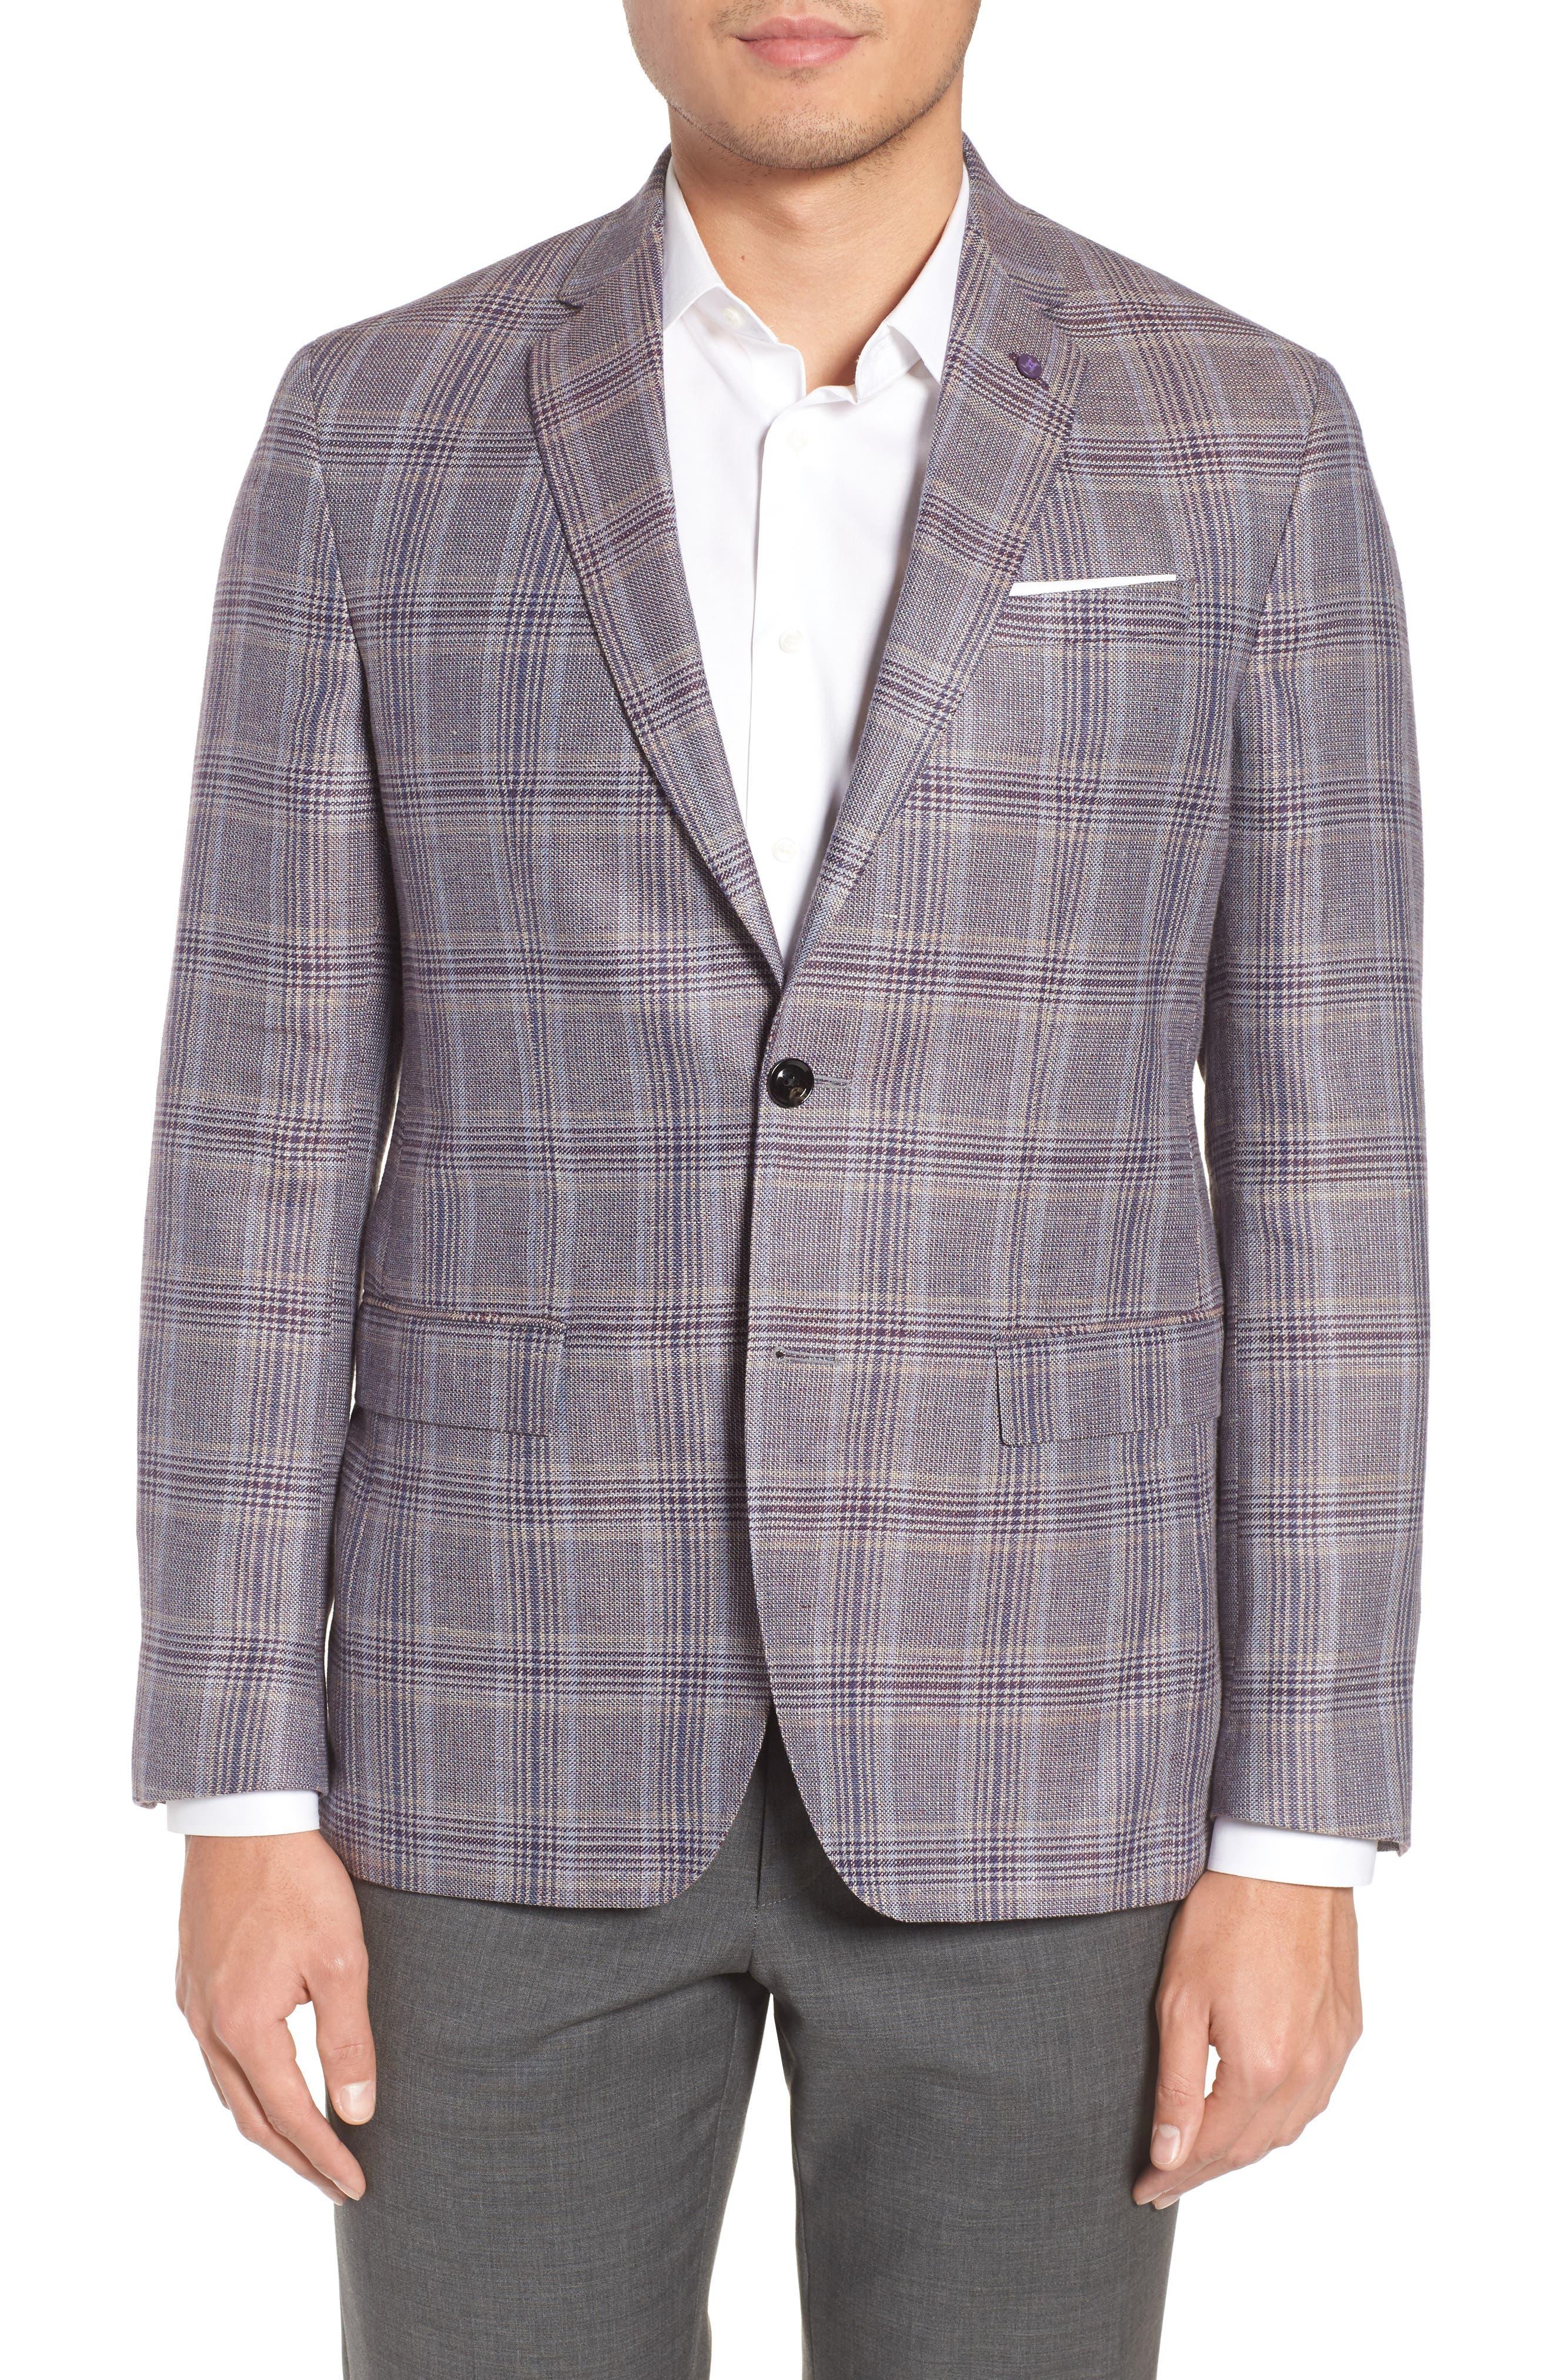 Konan Trim Fit Plaid Linen & Wool Sport Coat,                         Main,                         color, Tan